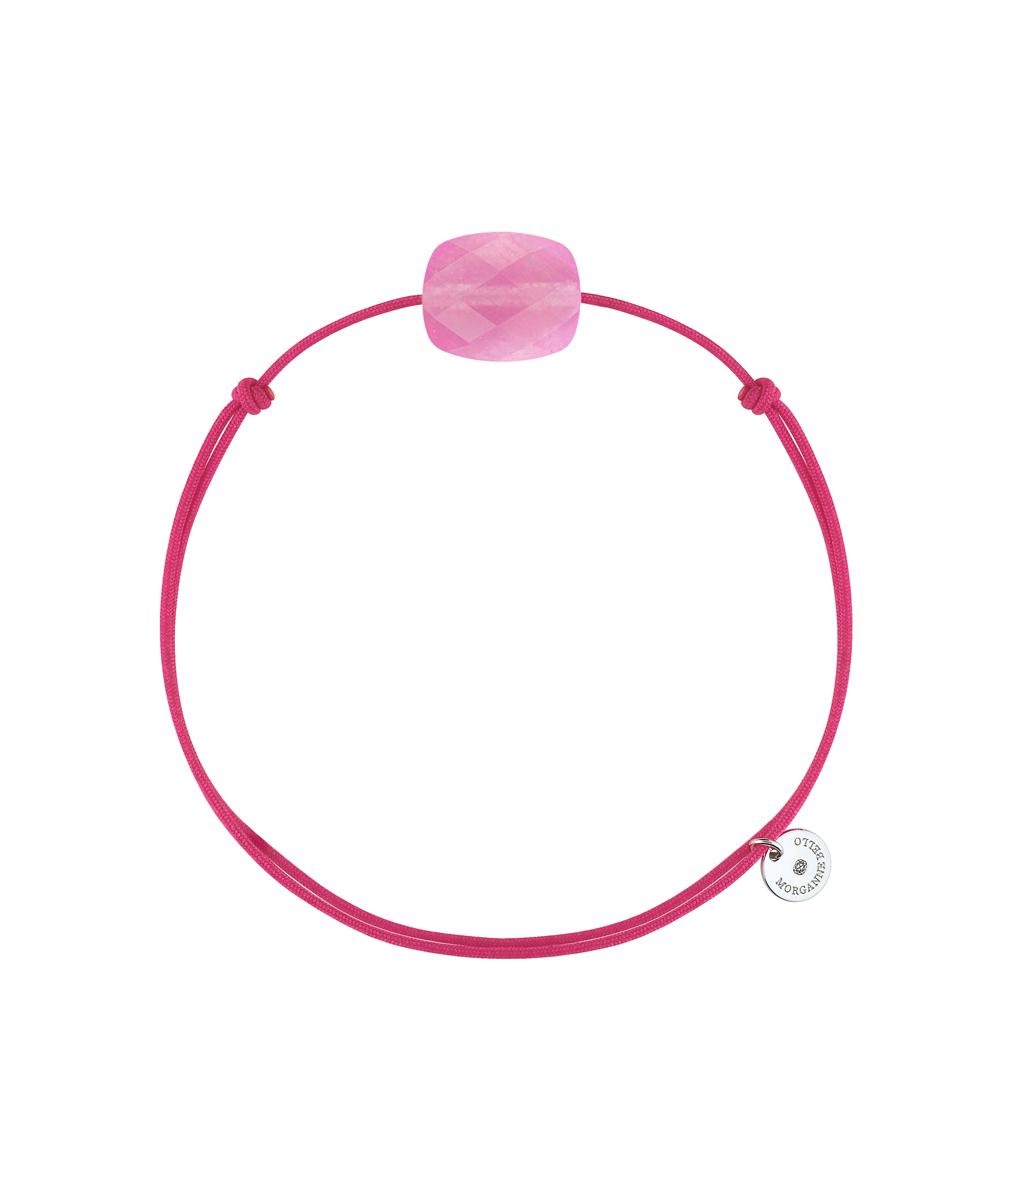 Bracelet Cordon Friandise Summer Coussin